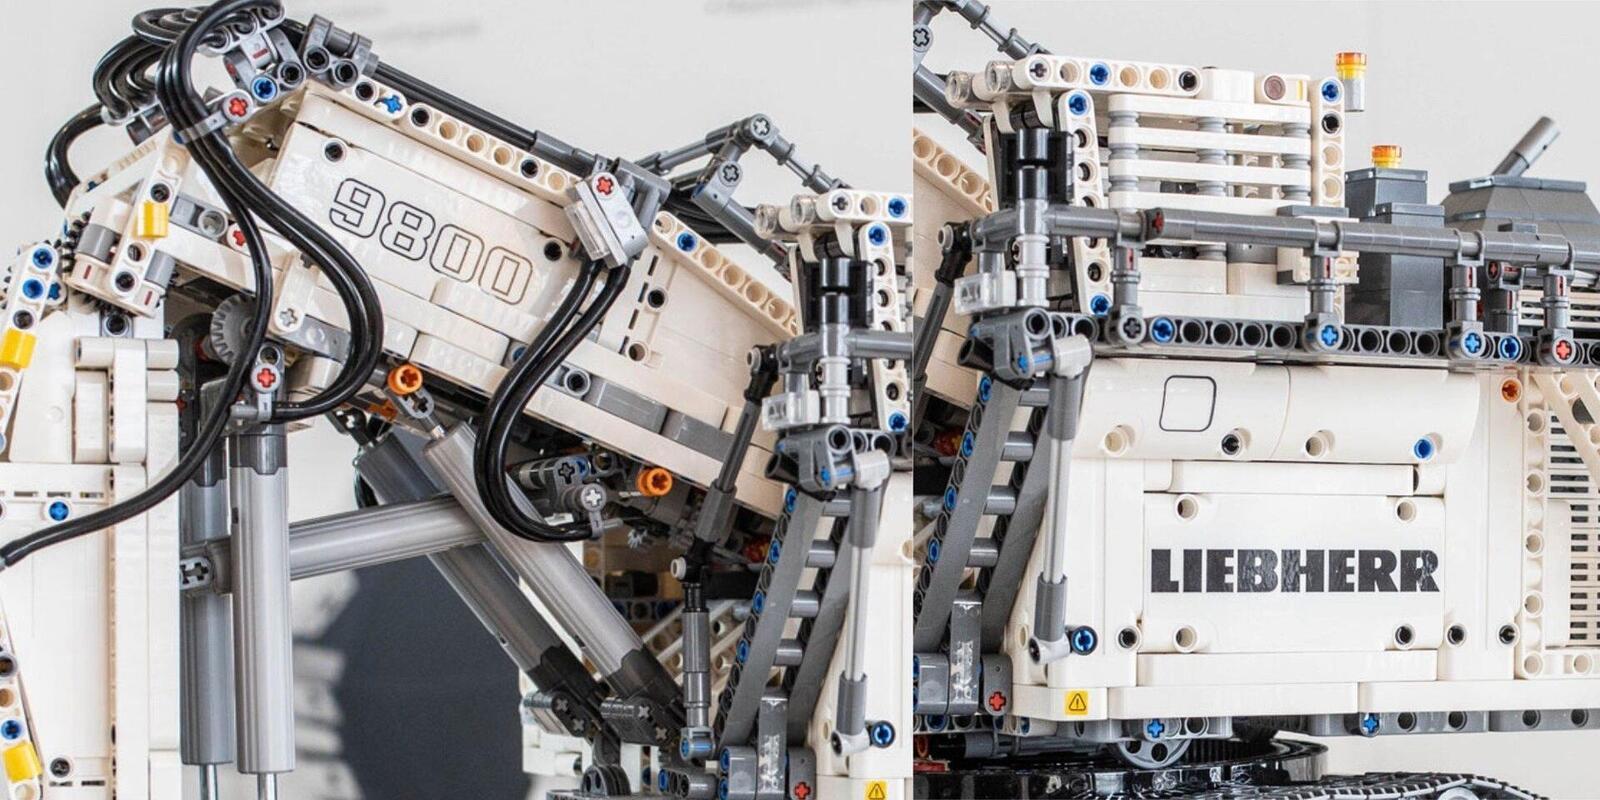 lego-sap-ra-mat-4100-manh-tech-liebherr-r-9800-1.jpg